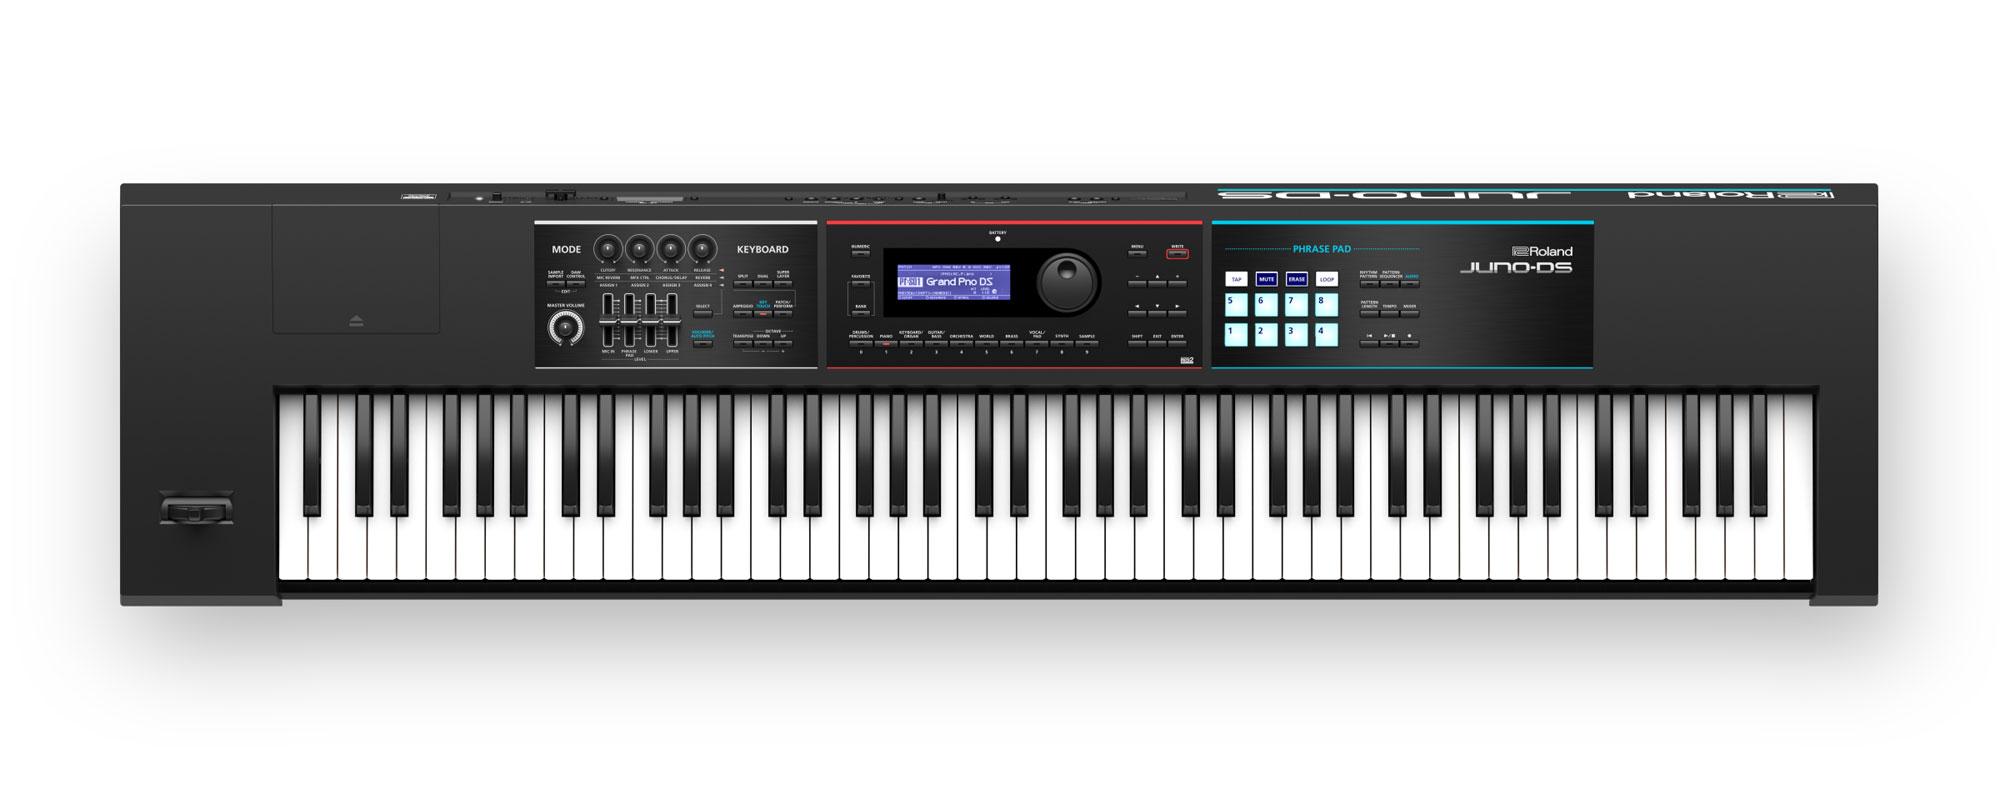 roland juno ds synthesizer. Black Bedroom Furniture Sets. Home Design Ideas